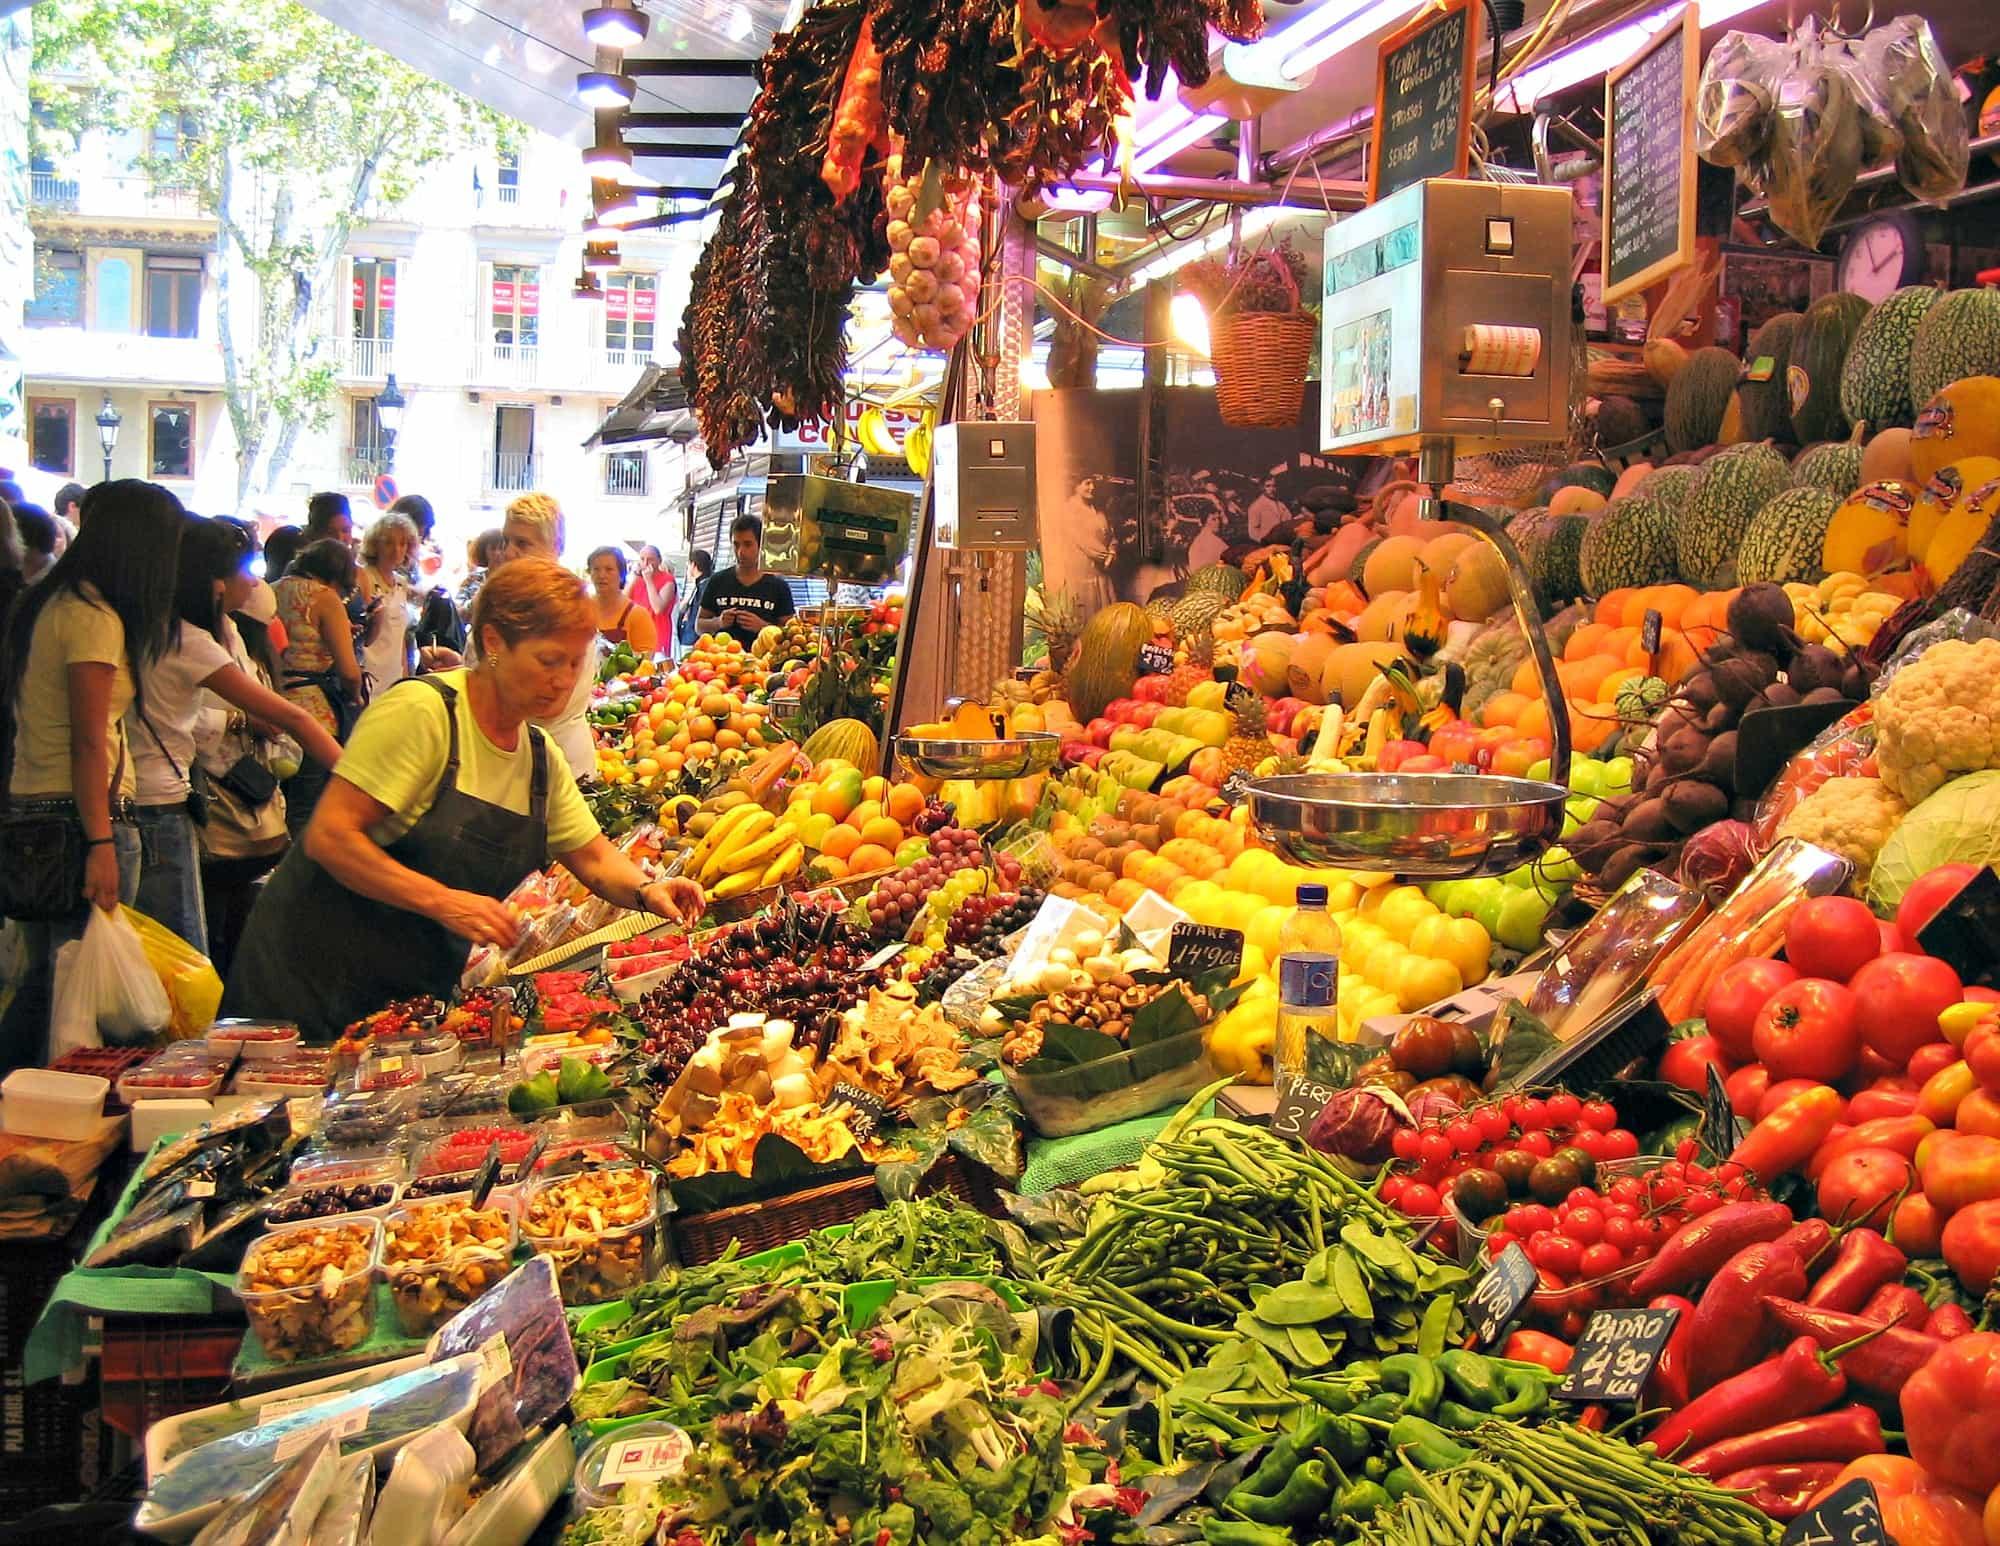 La Boqueria food market along La Rambla in Barcelona with kids